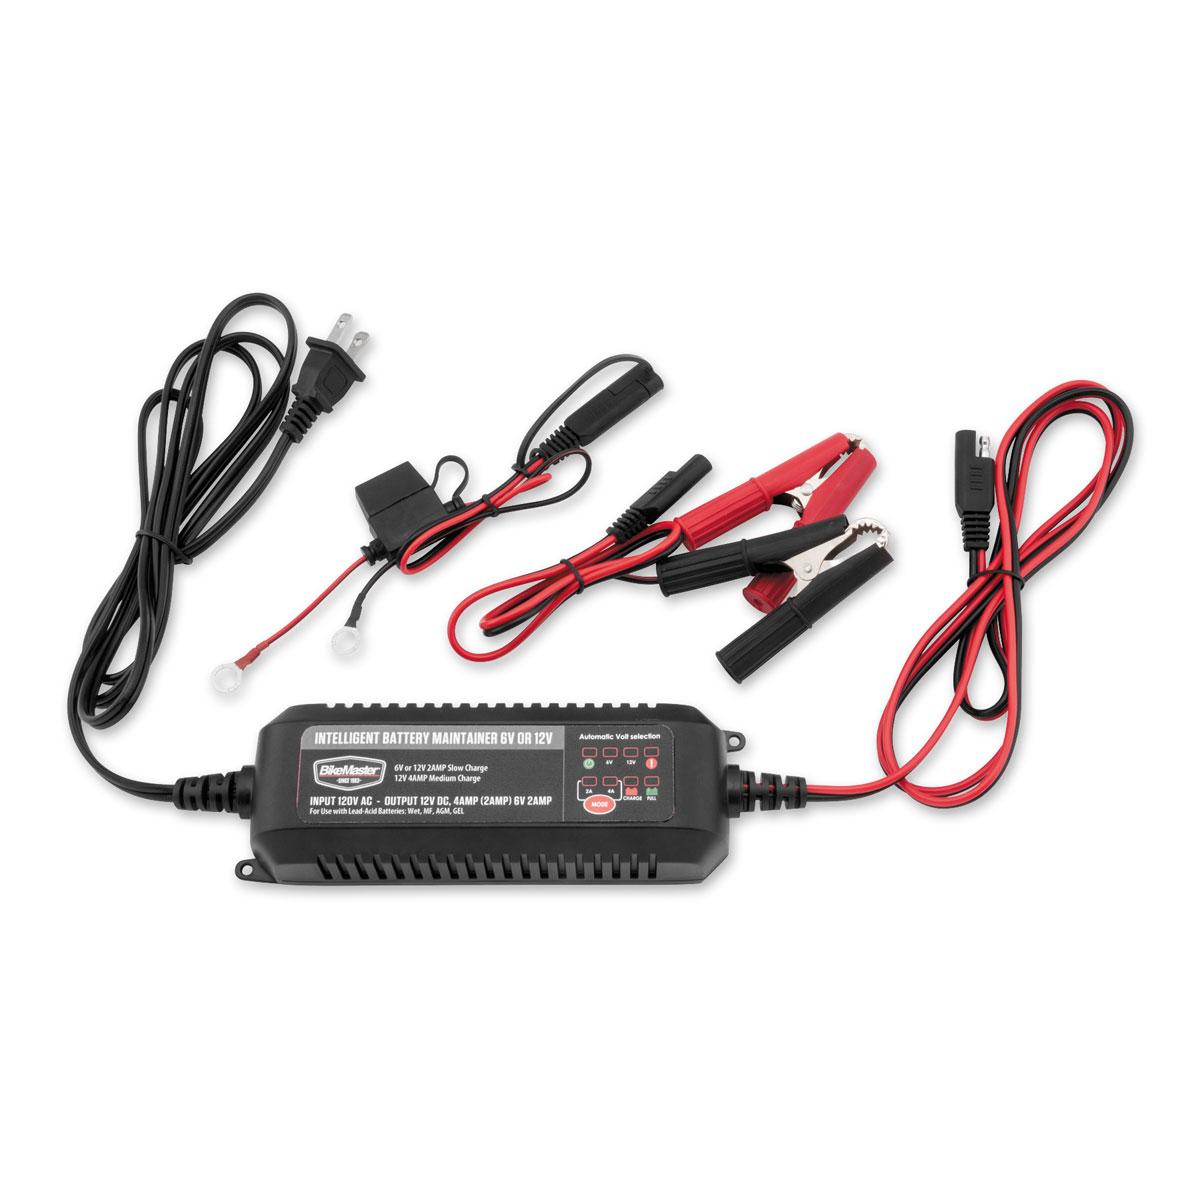 BikeMaster Intelligent Battery Charger/Maintainer